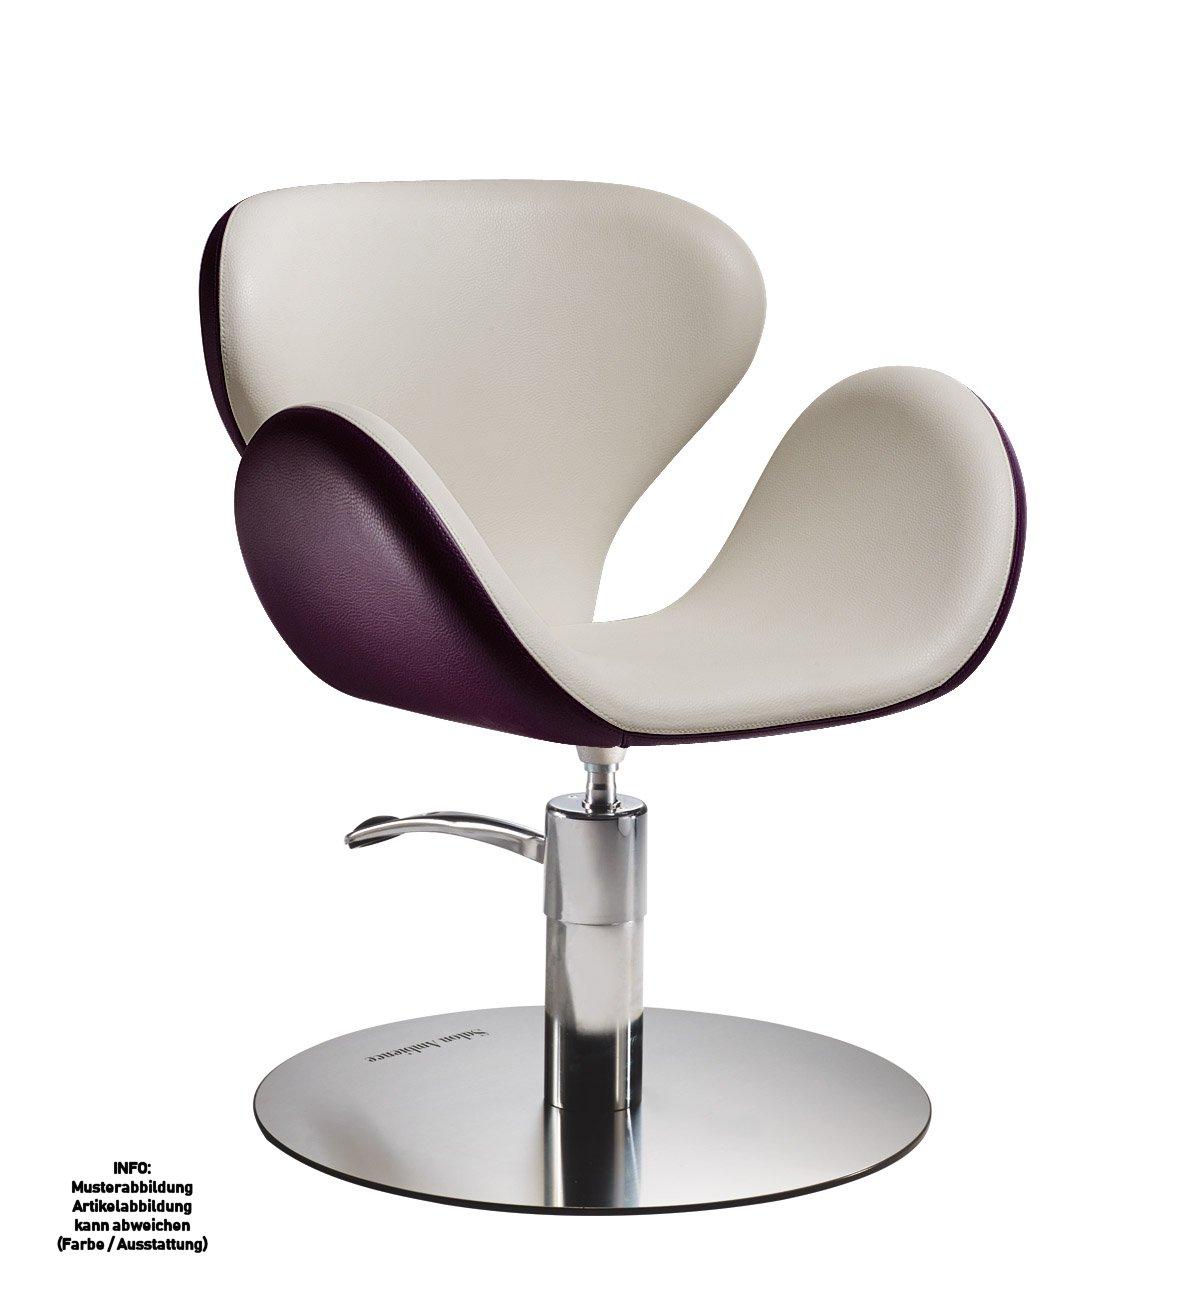 Möbel Salon Möbel Friseur Stuhl. Liefern Gehobenen Friseurstuhl